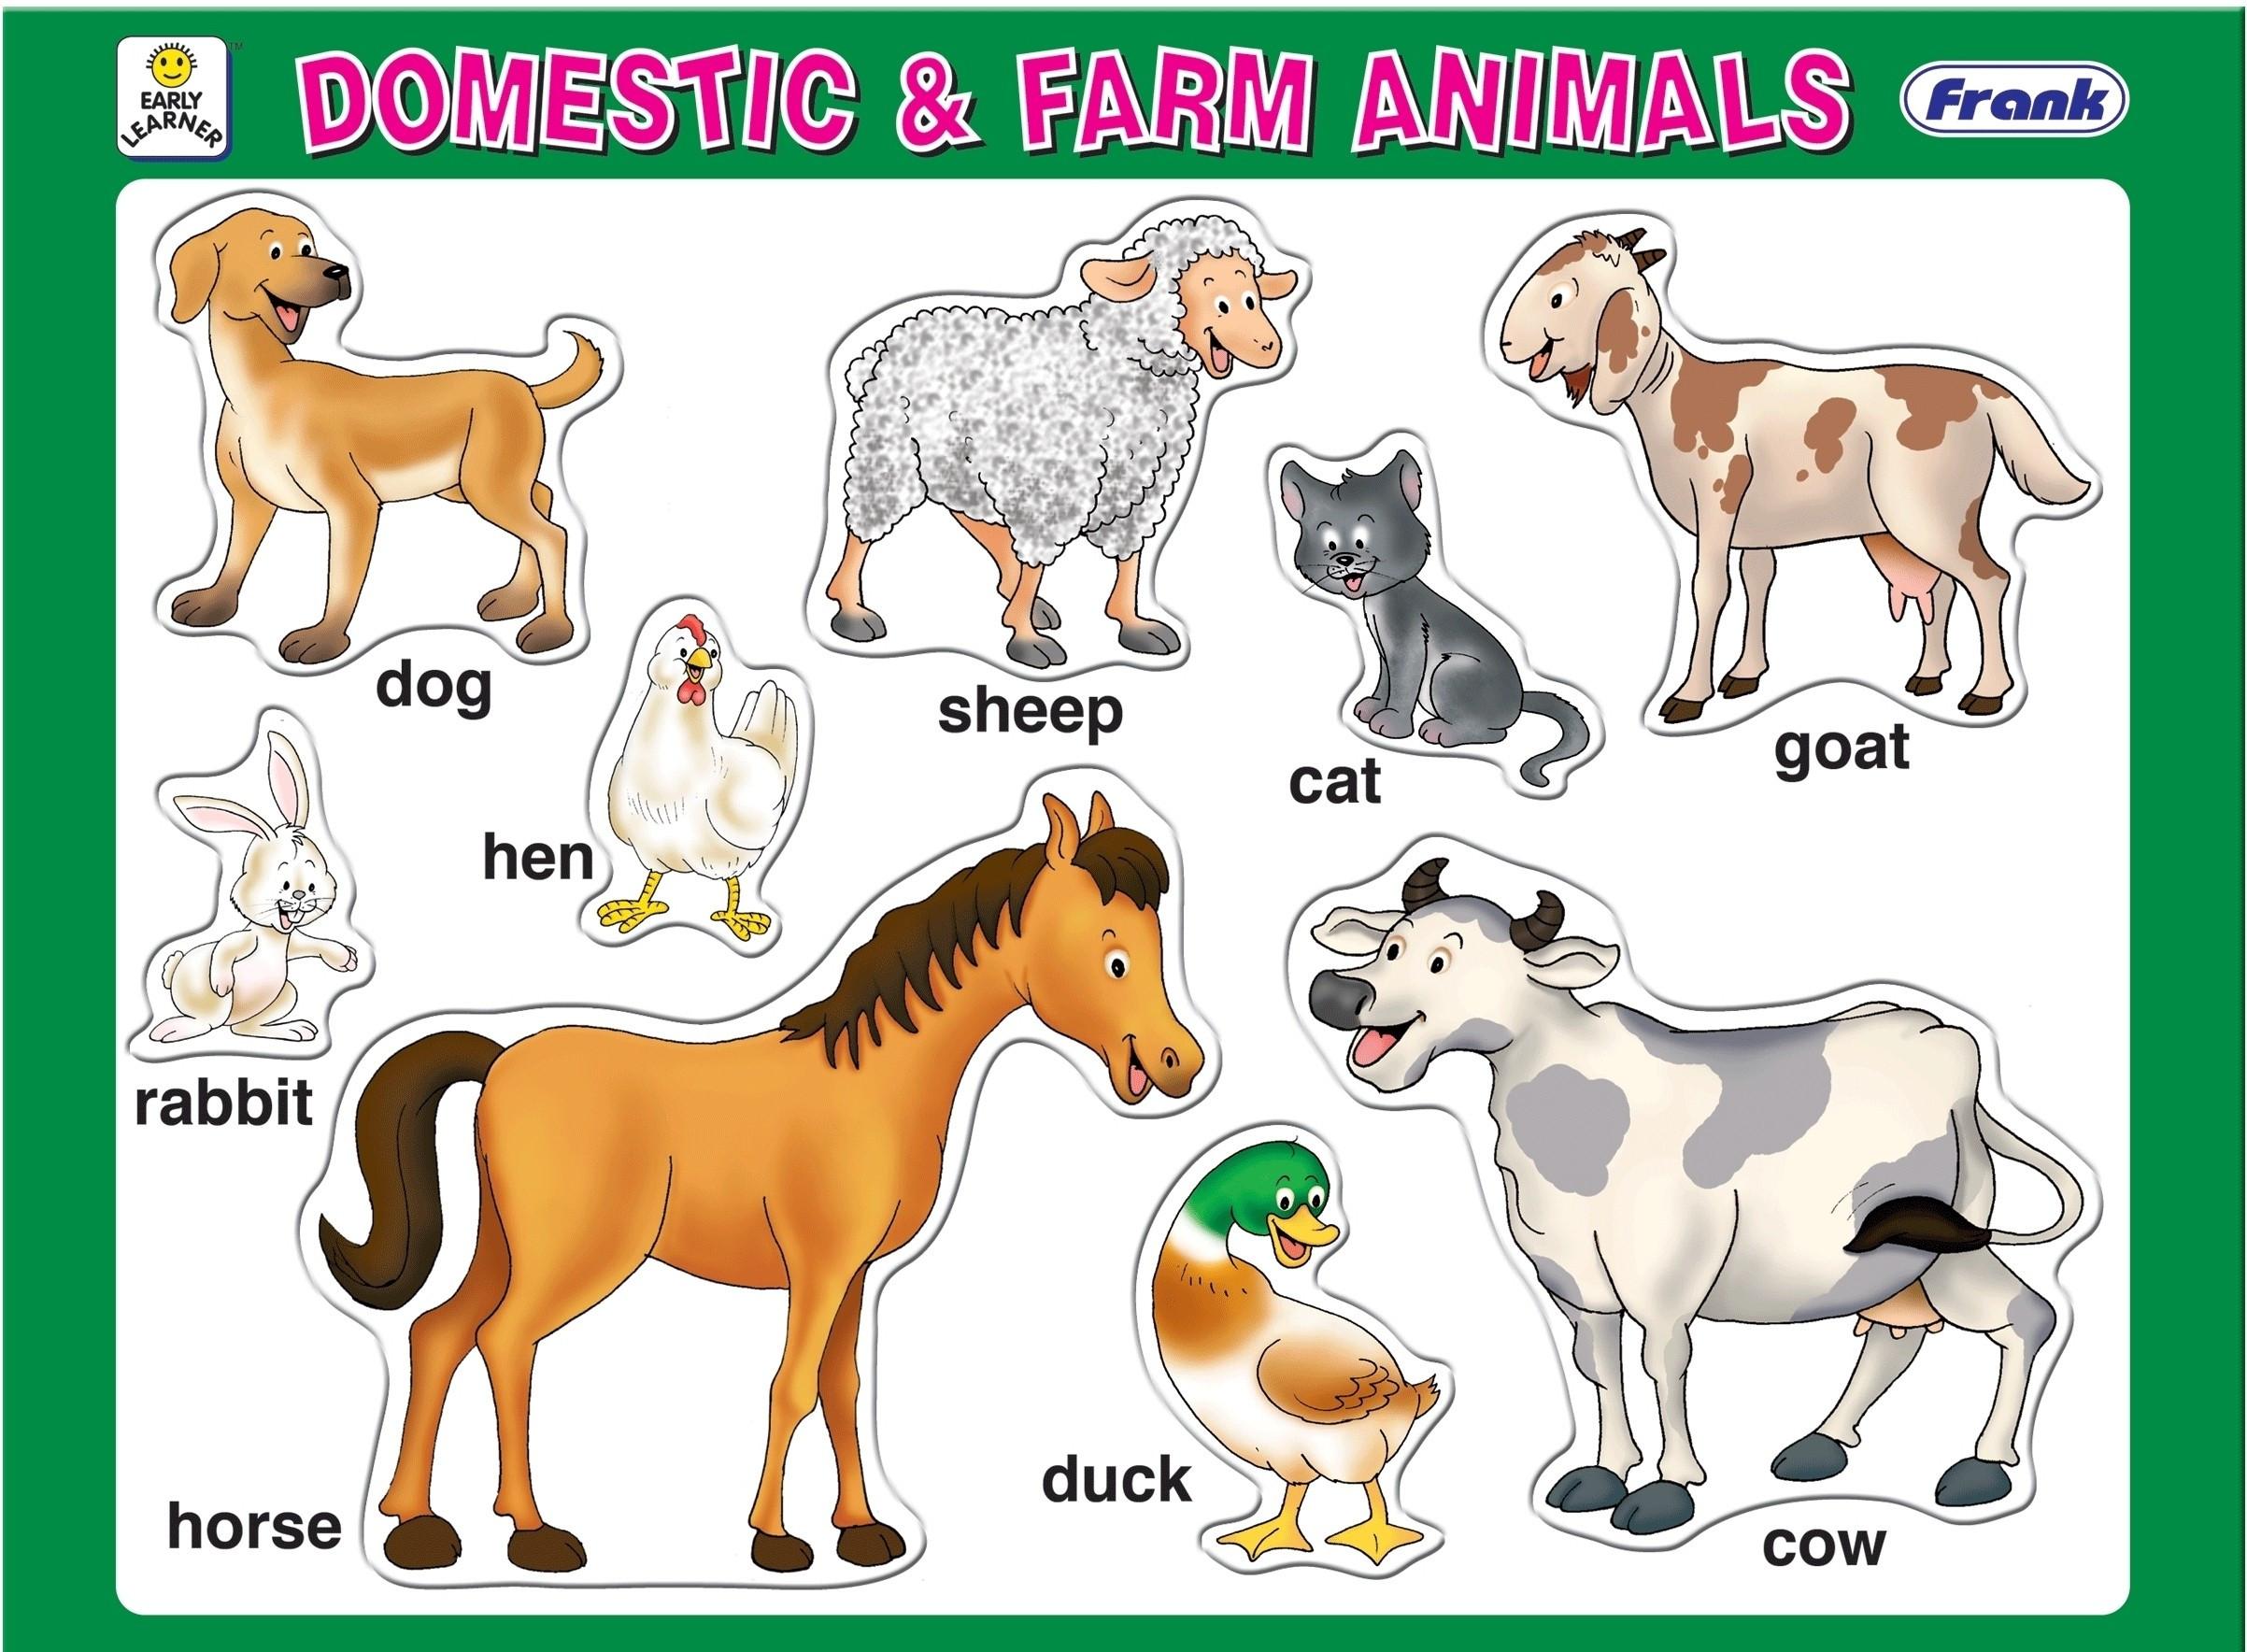 Frank Domestic And Farm Animals